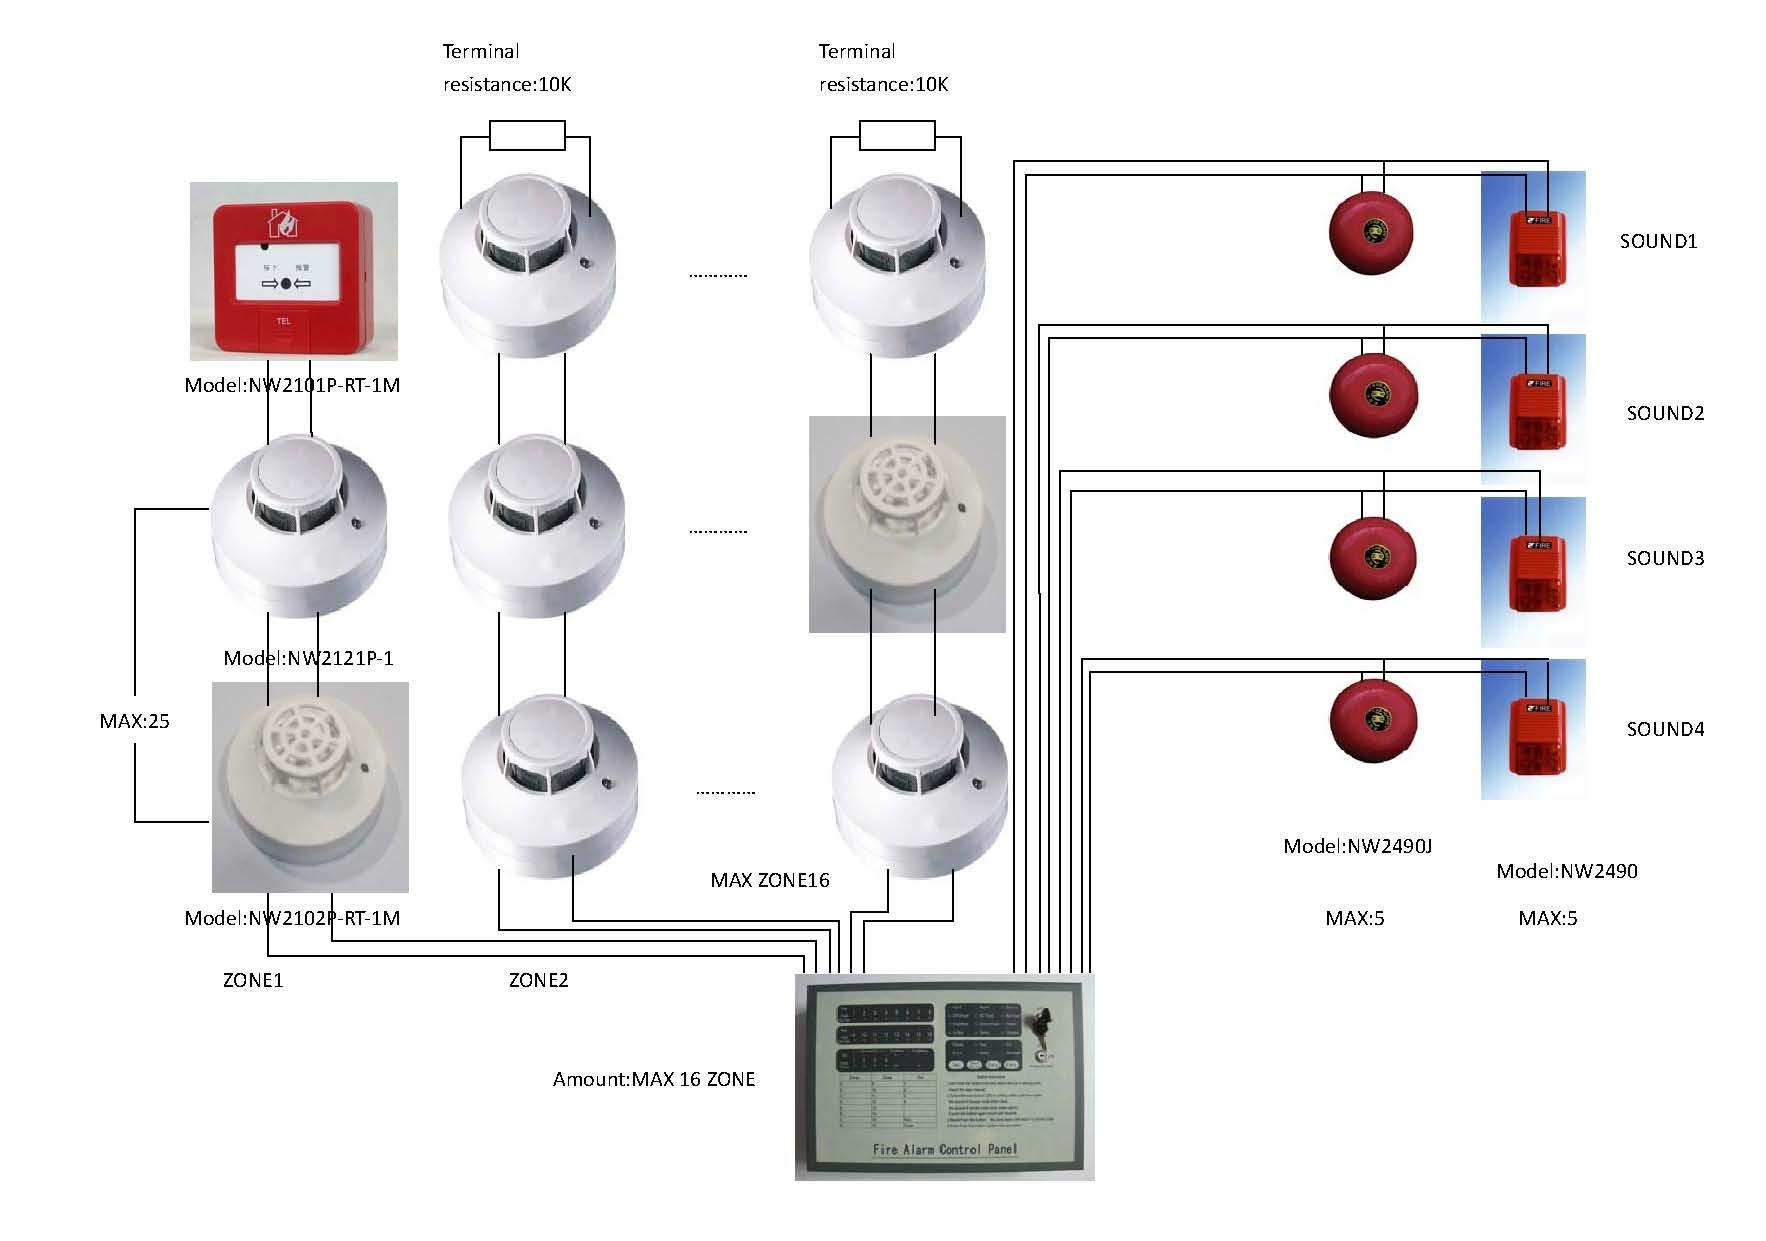 edwards addressable fire alarm wiring diagram wiringdiagrams fire alarm wiring diagram schematic at Edwards Fire Alarm Wiring